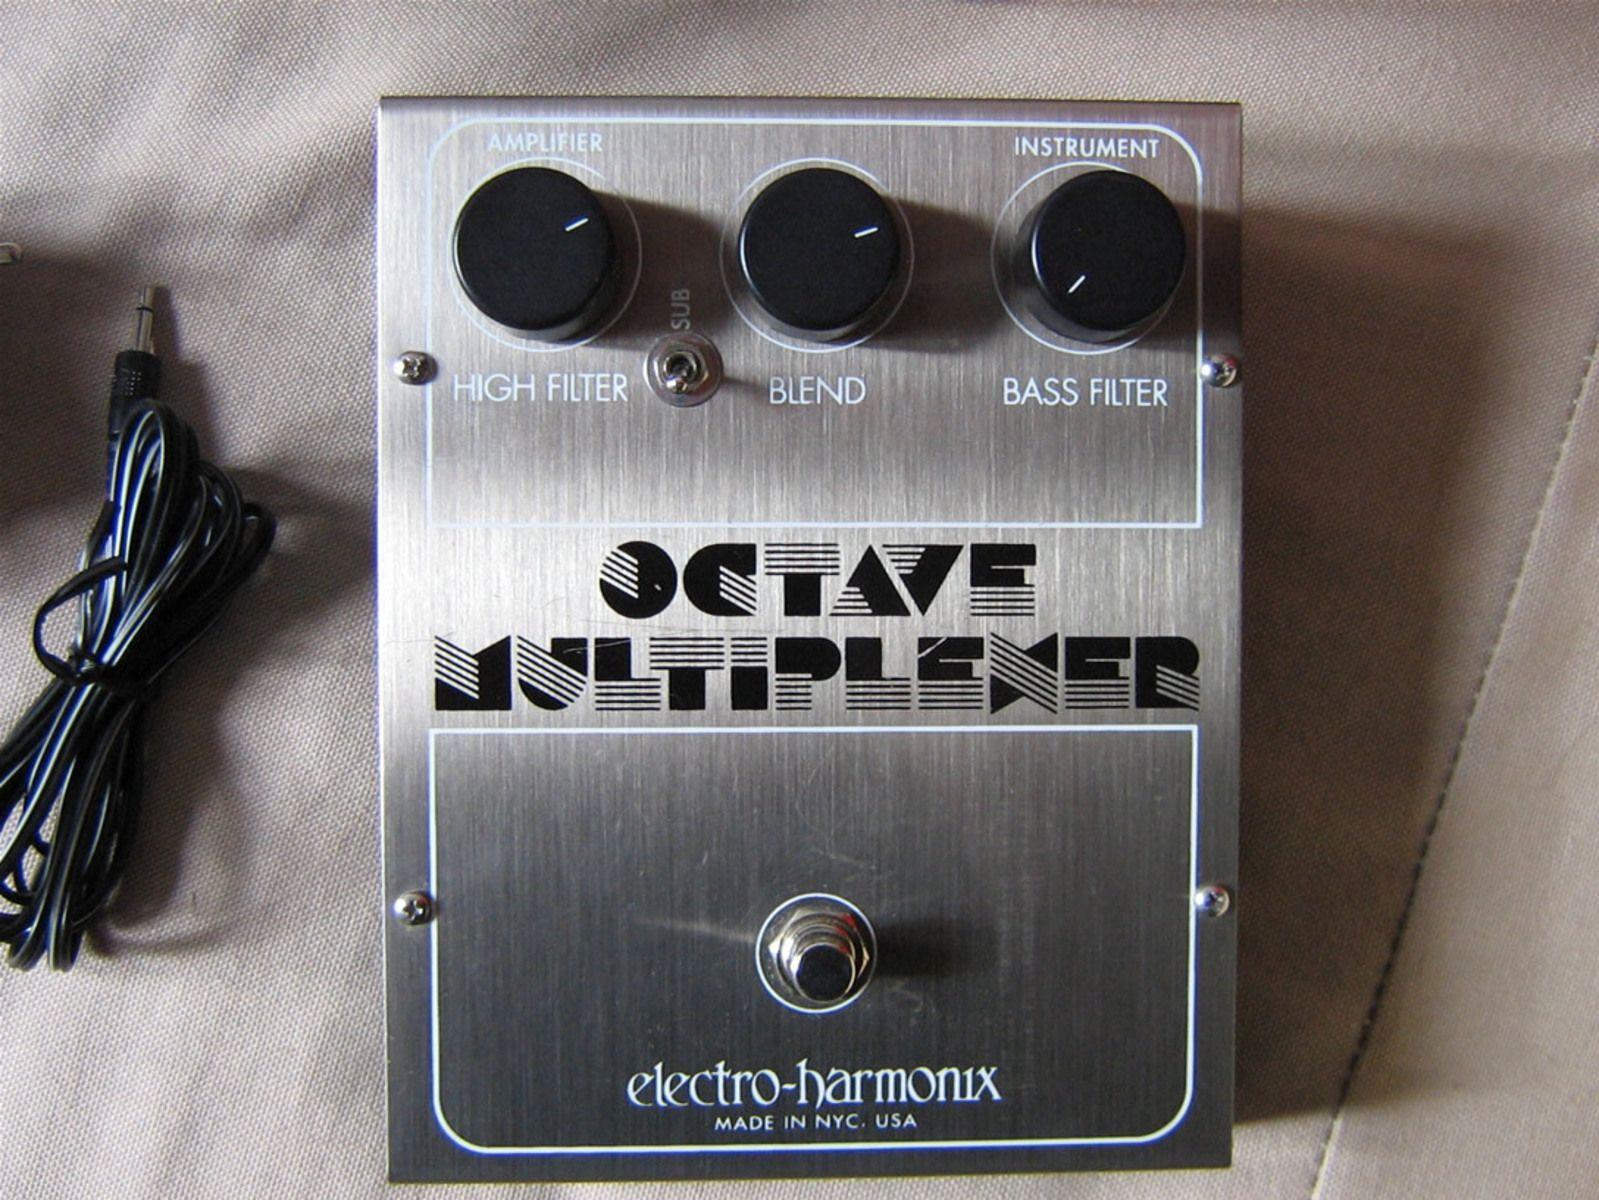 electro harmonix octave multiplexer reissue image 16674 audiofanzine. Black Bedroom Furniture Sets. Home Design Ideas